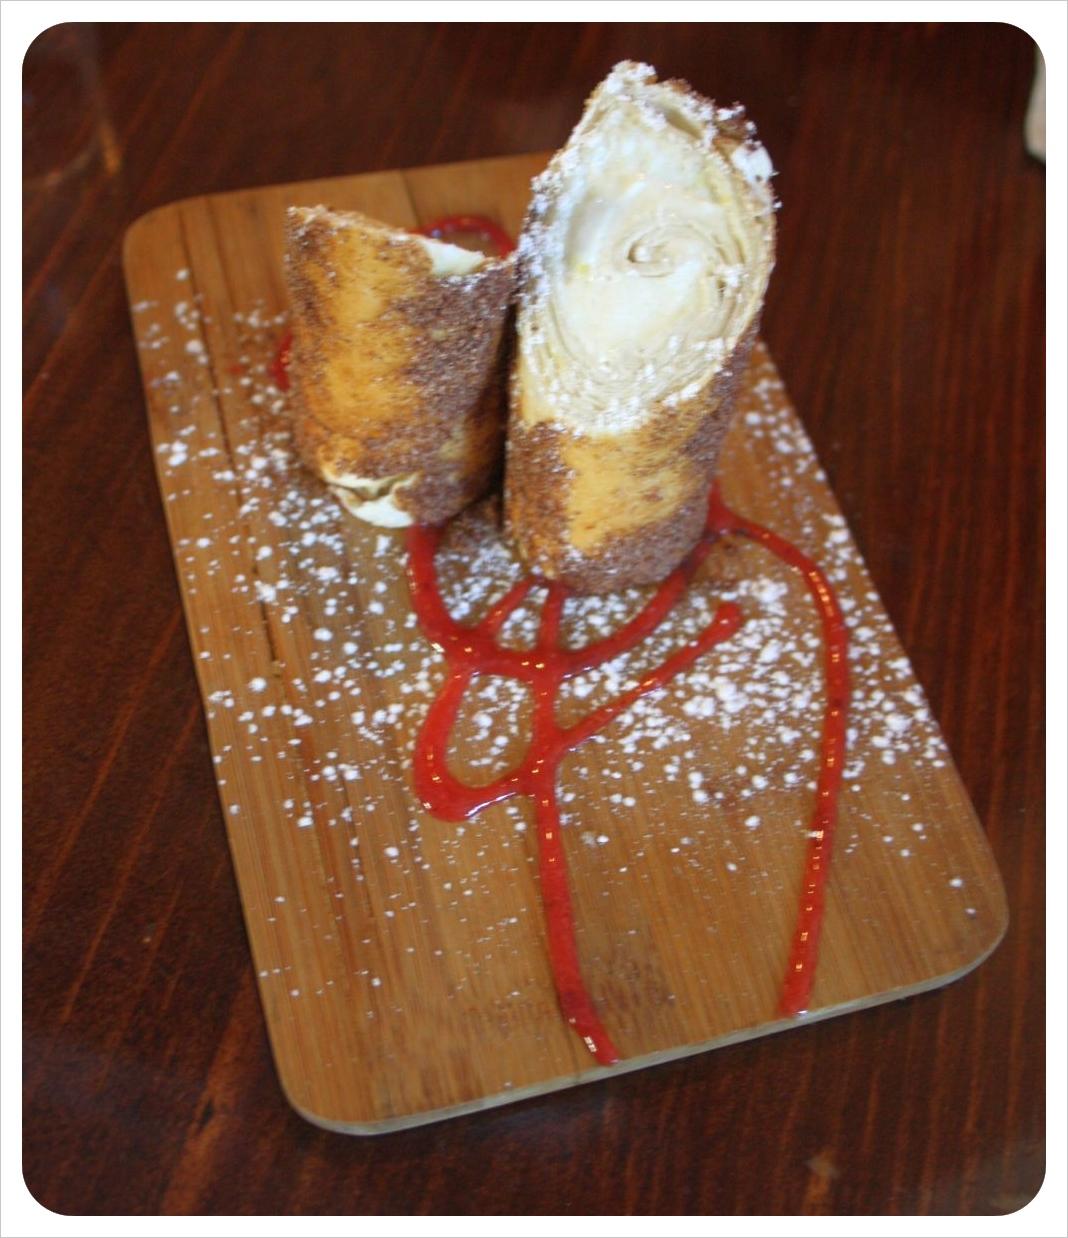 philadelphia cheese cake churro at Hawthornes